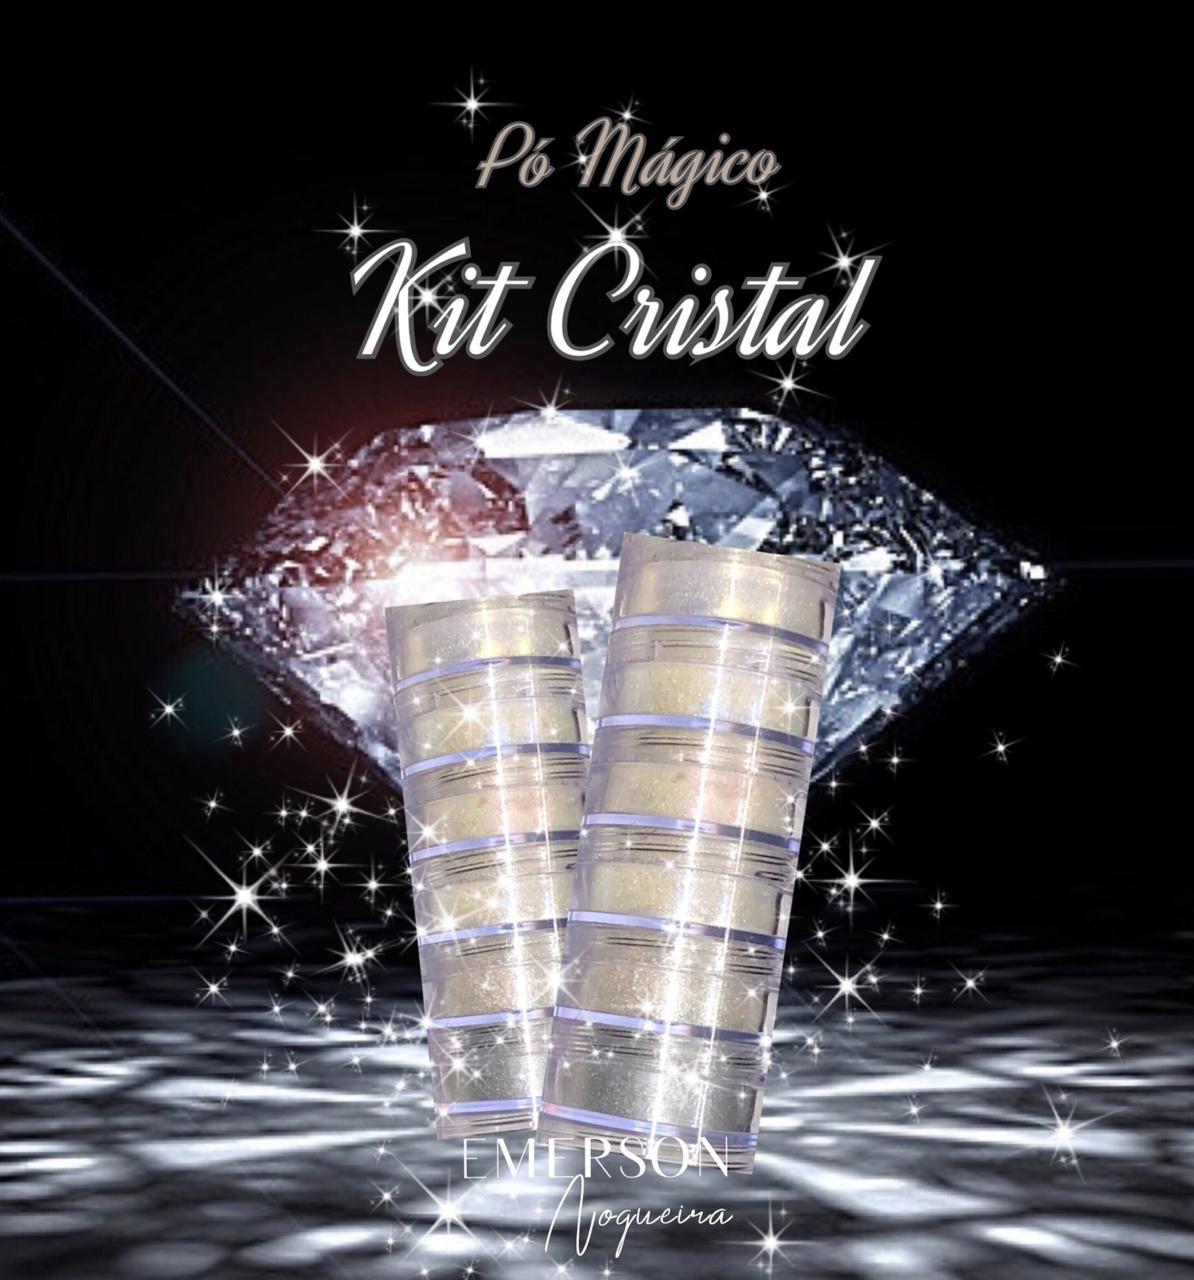 Pó Mágico Kit cristal